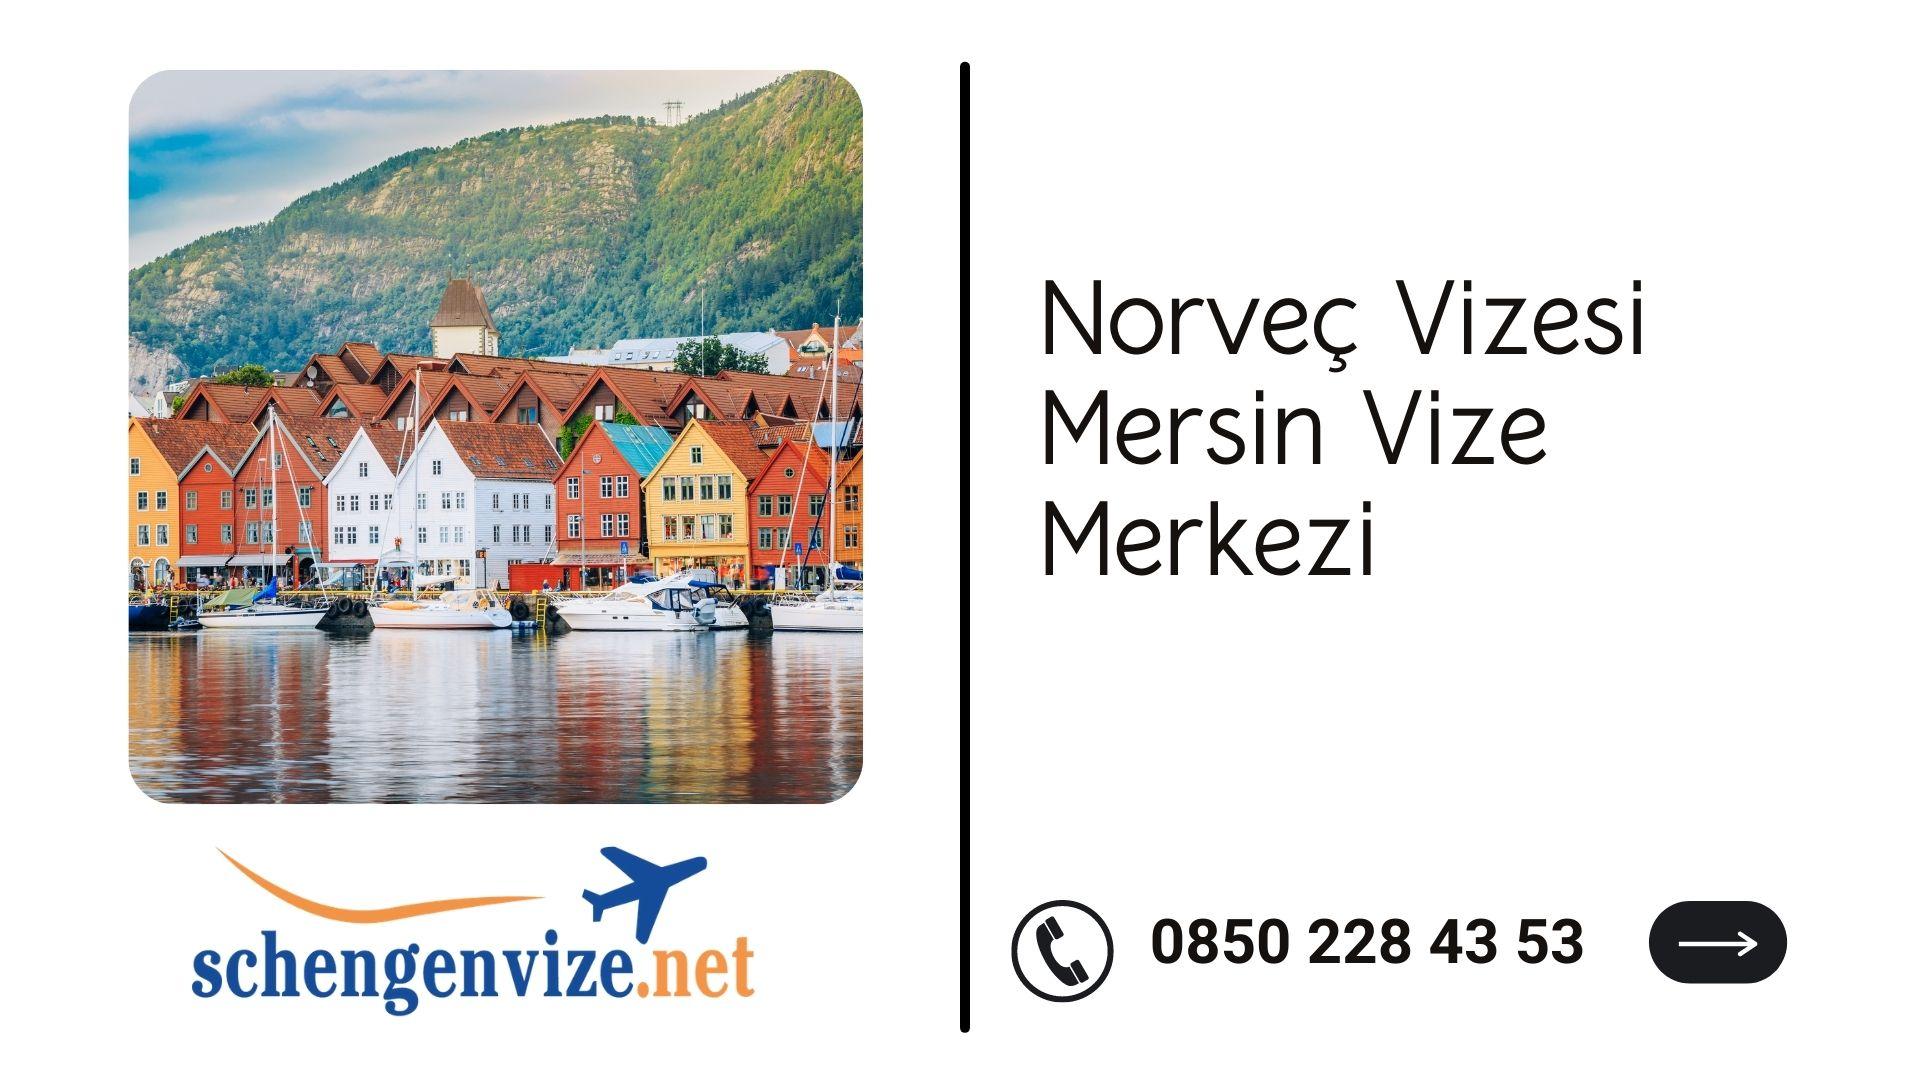 Norveç Vizesi Mersin Vize Merkezi